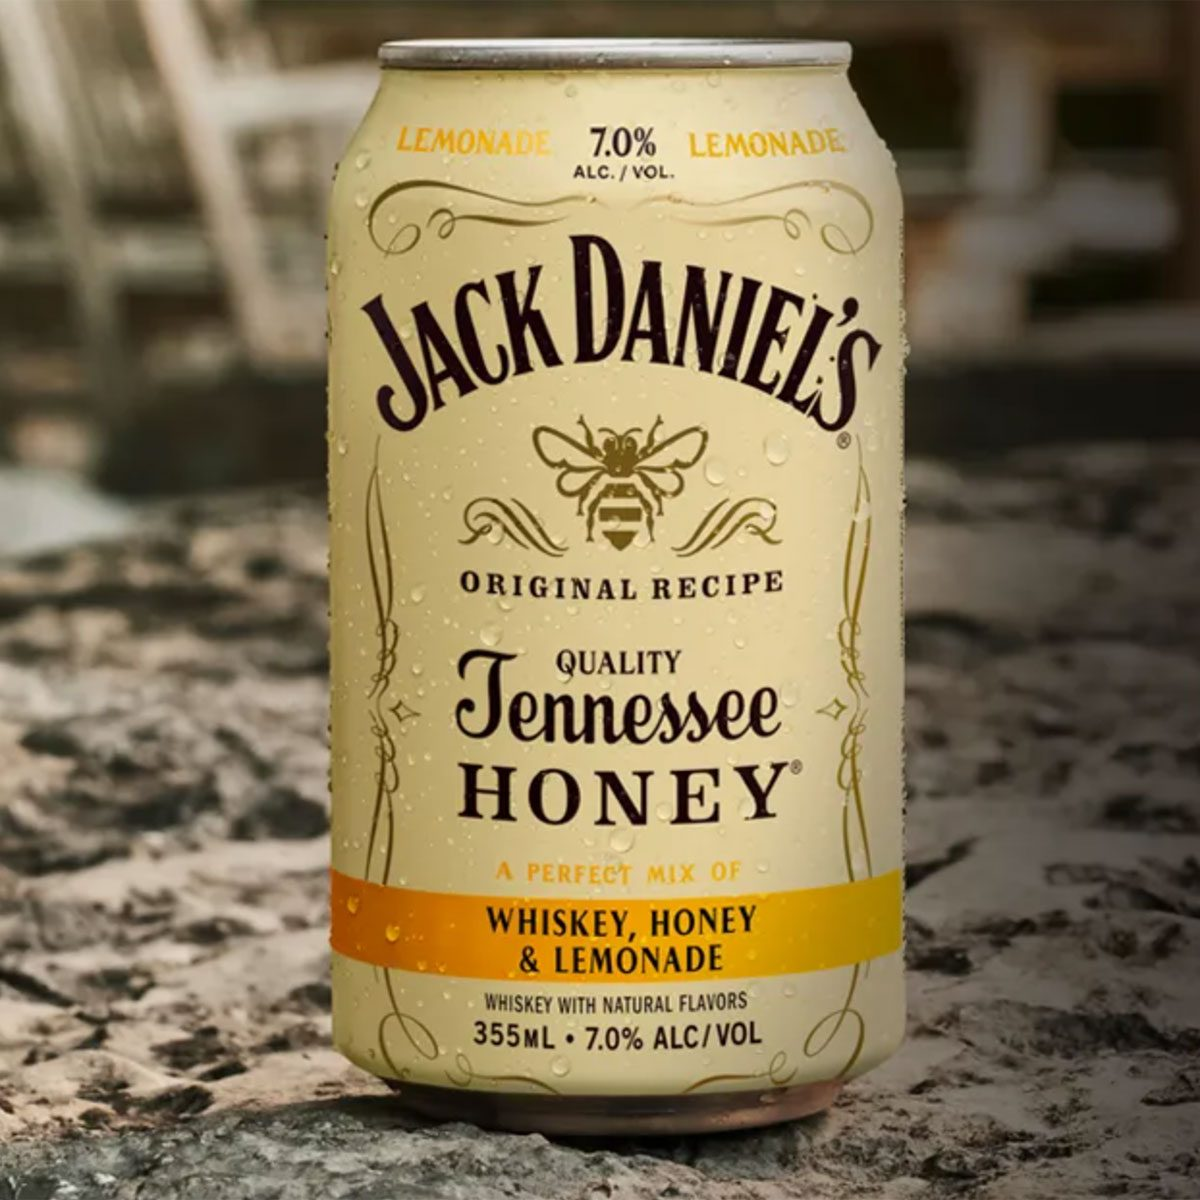 Jack Daniels Tennessee Honey and Lemonade